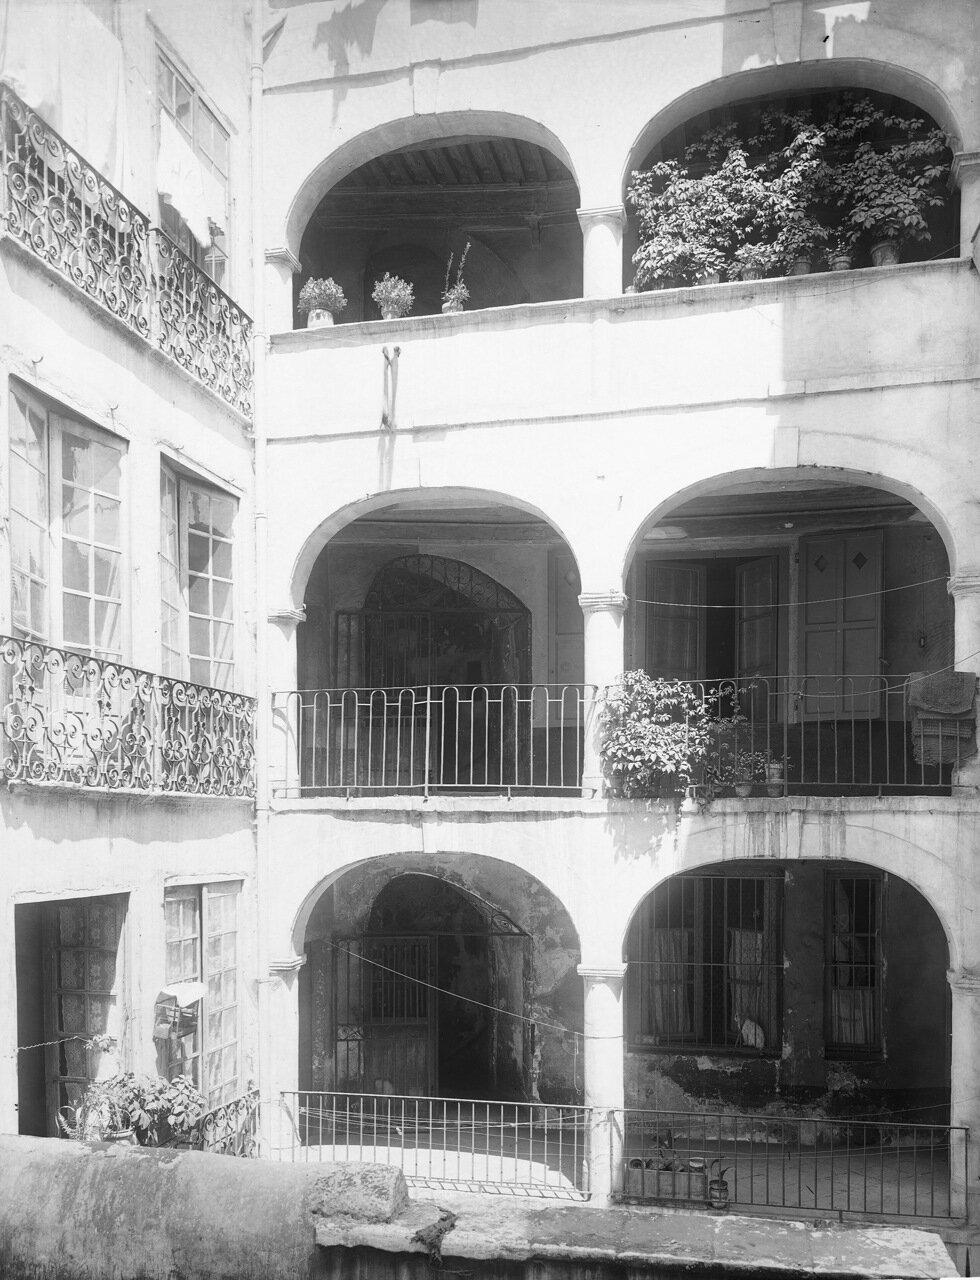 Еврейская улица. Галерея во дворе дома Баронната